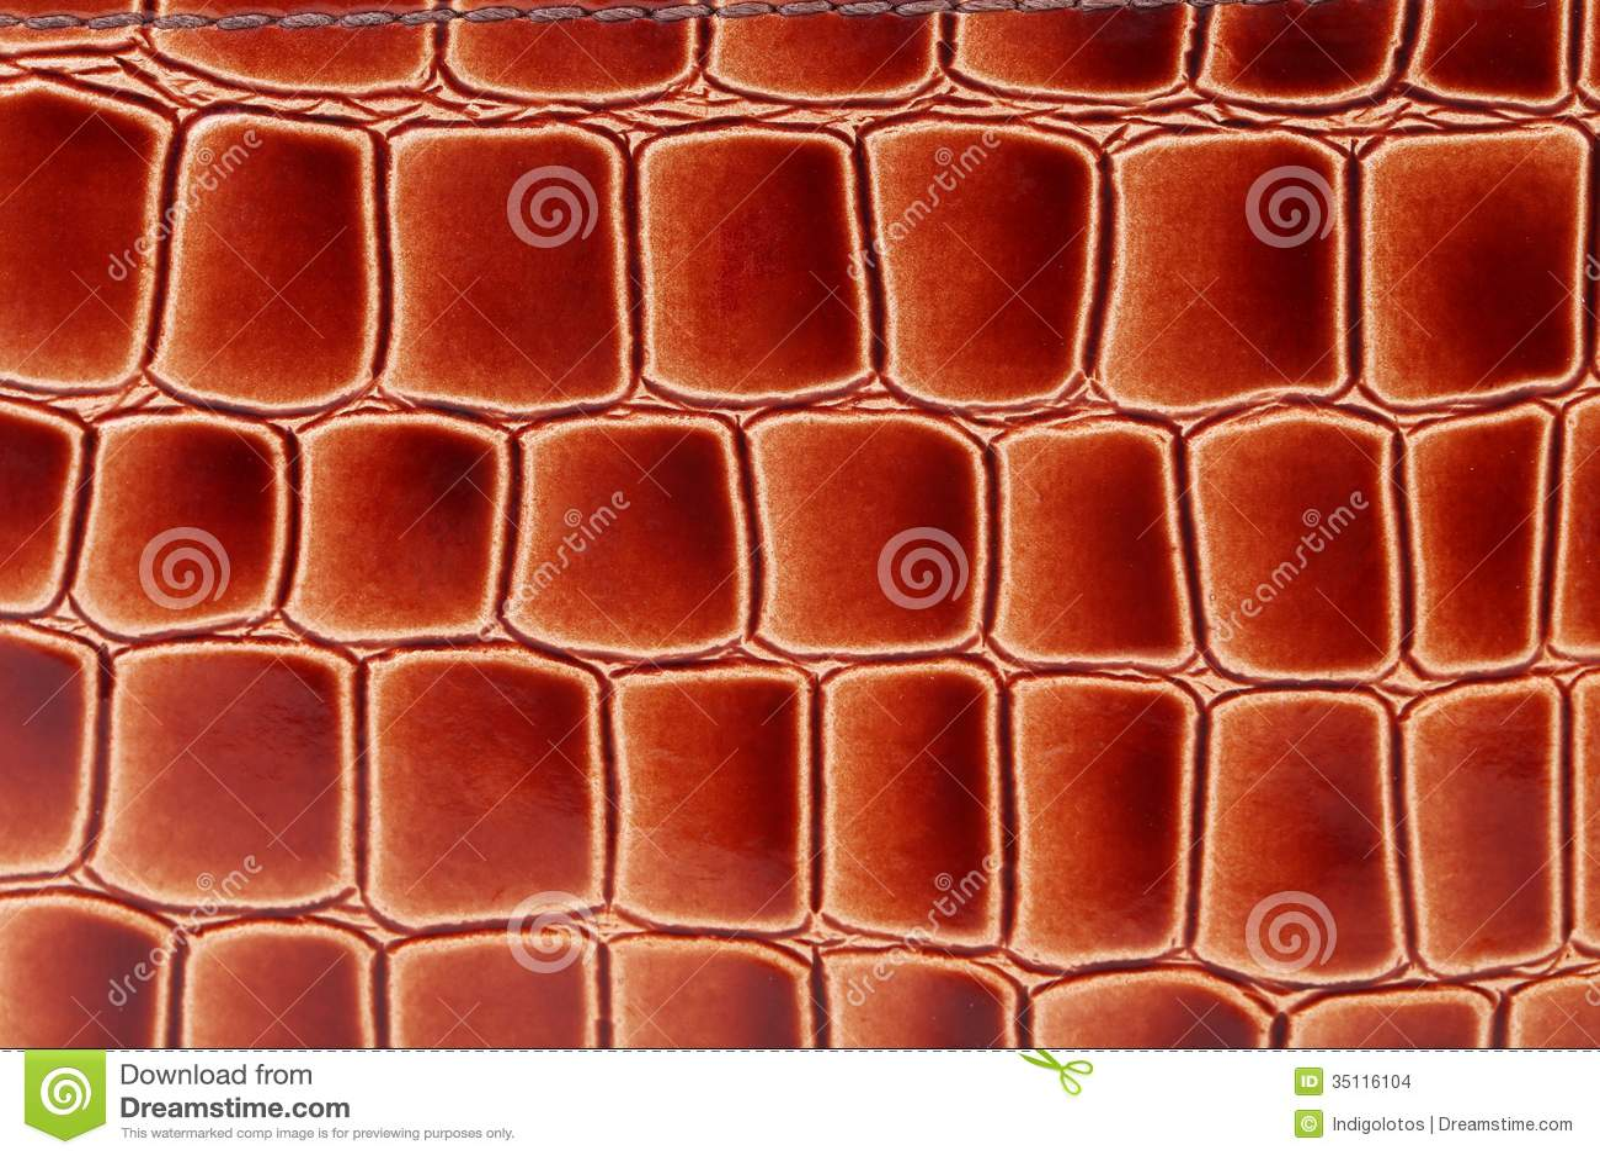 Red brown color of crocodile skin.